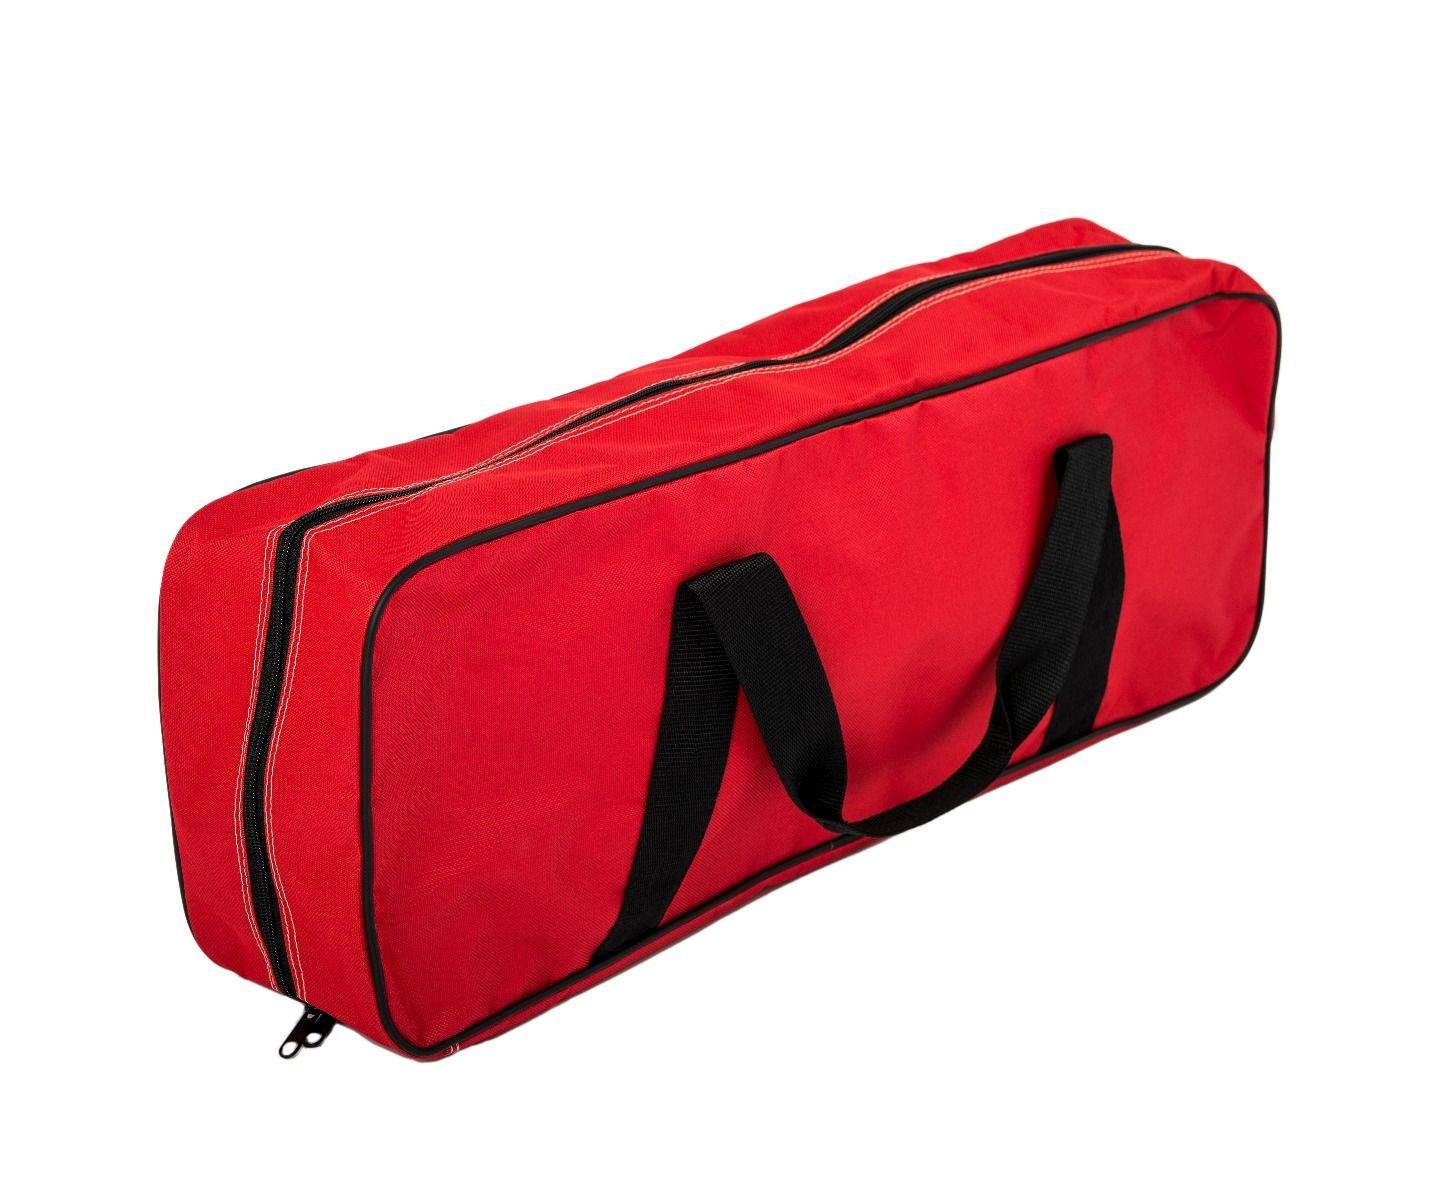 Cervical Collar / Neck Brace Carry Bag - Emergency Services